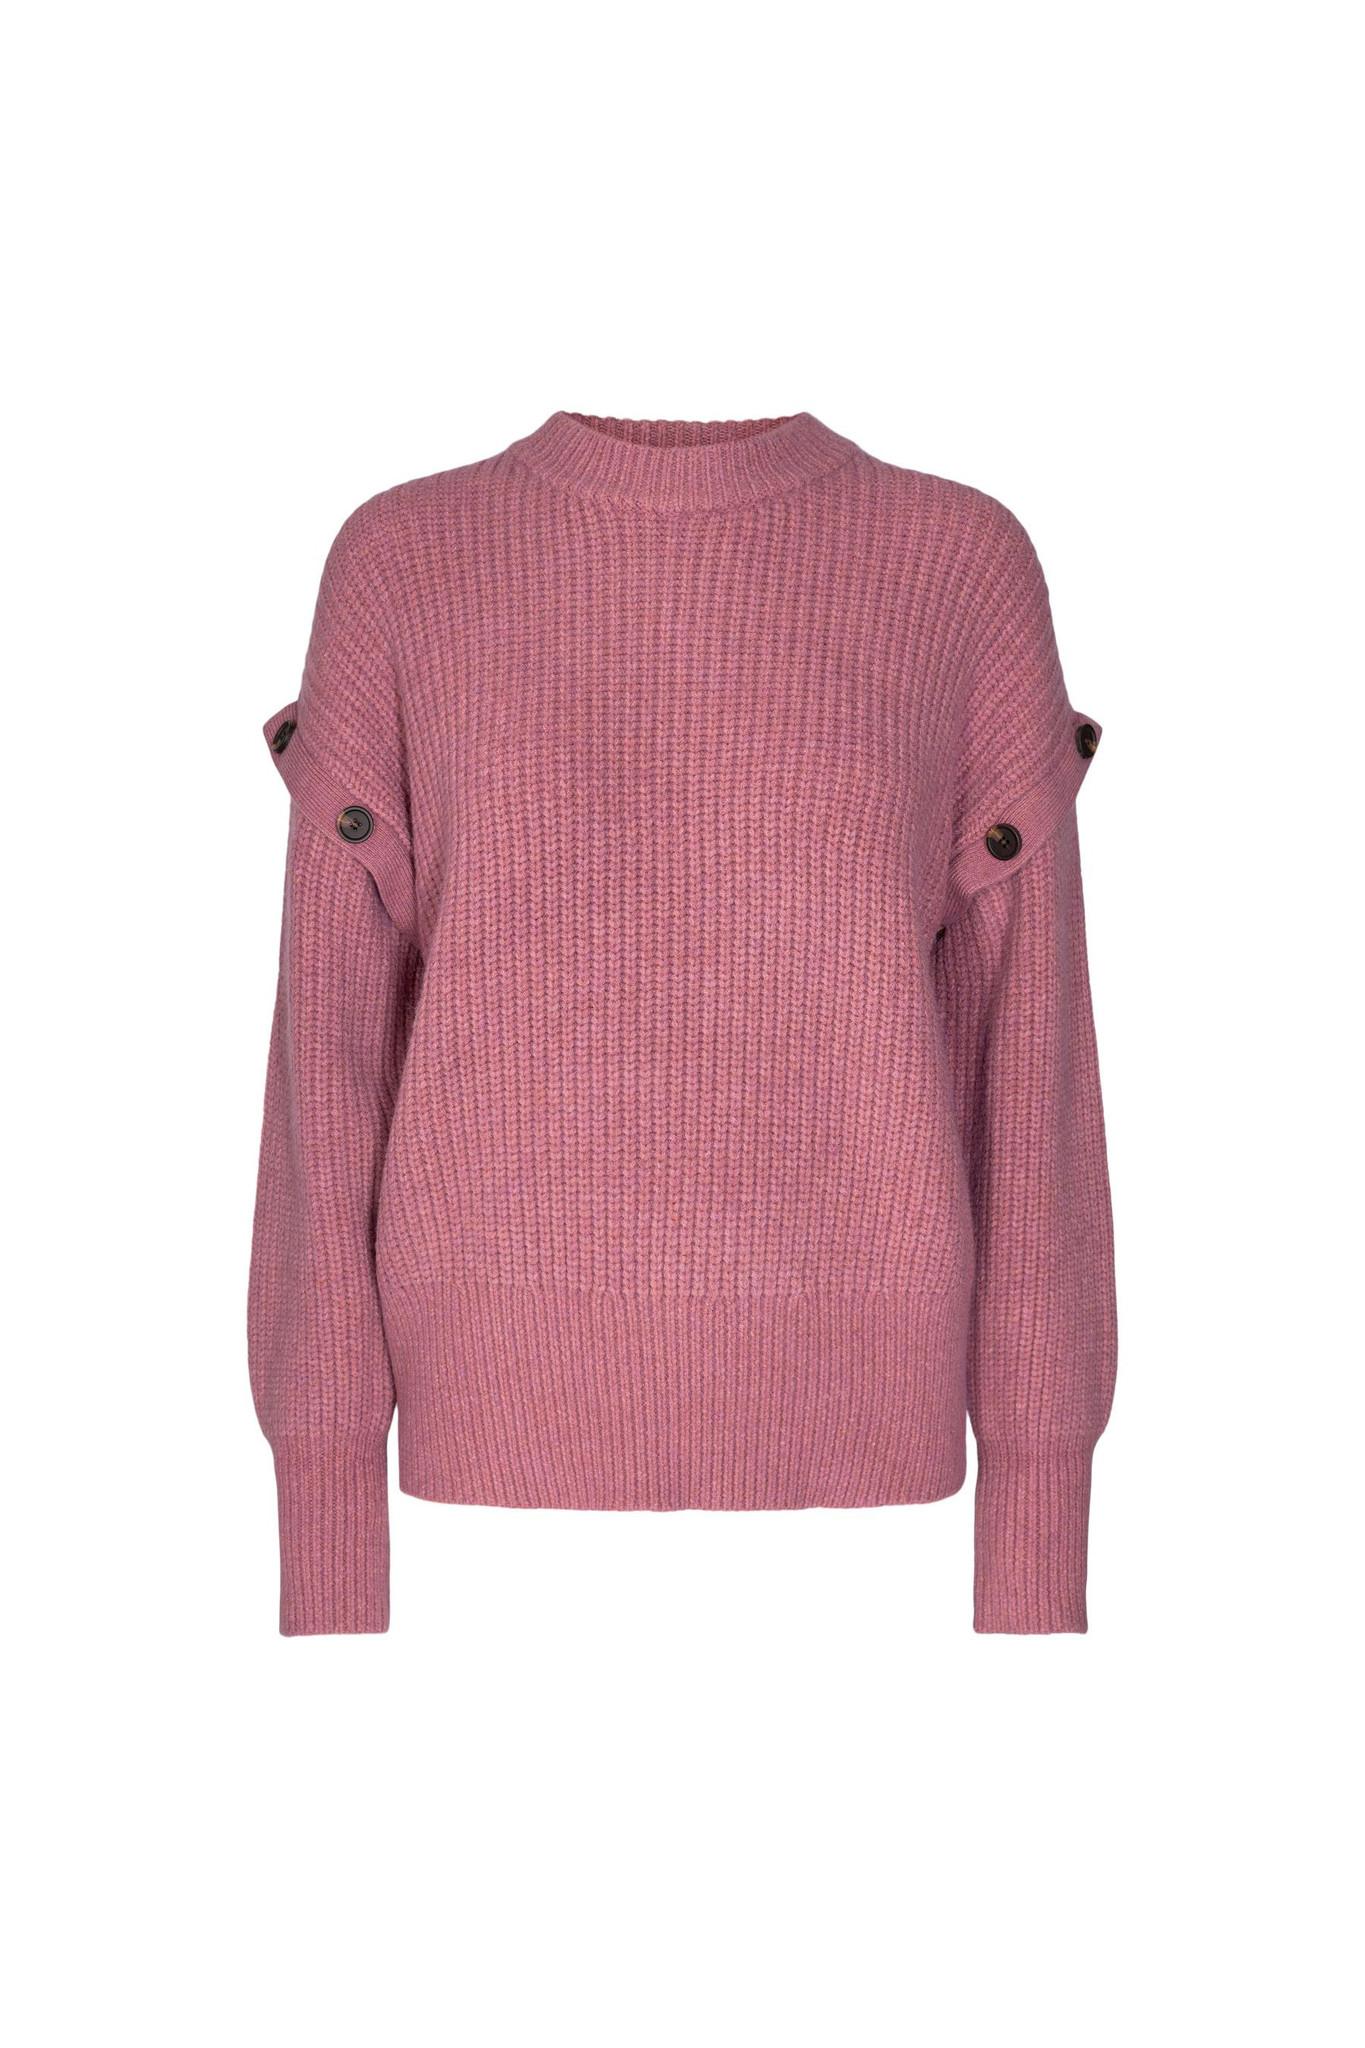 Rowie Button Knit - Pink-1